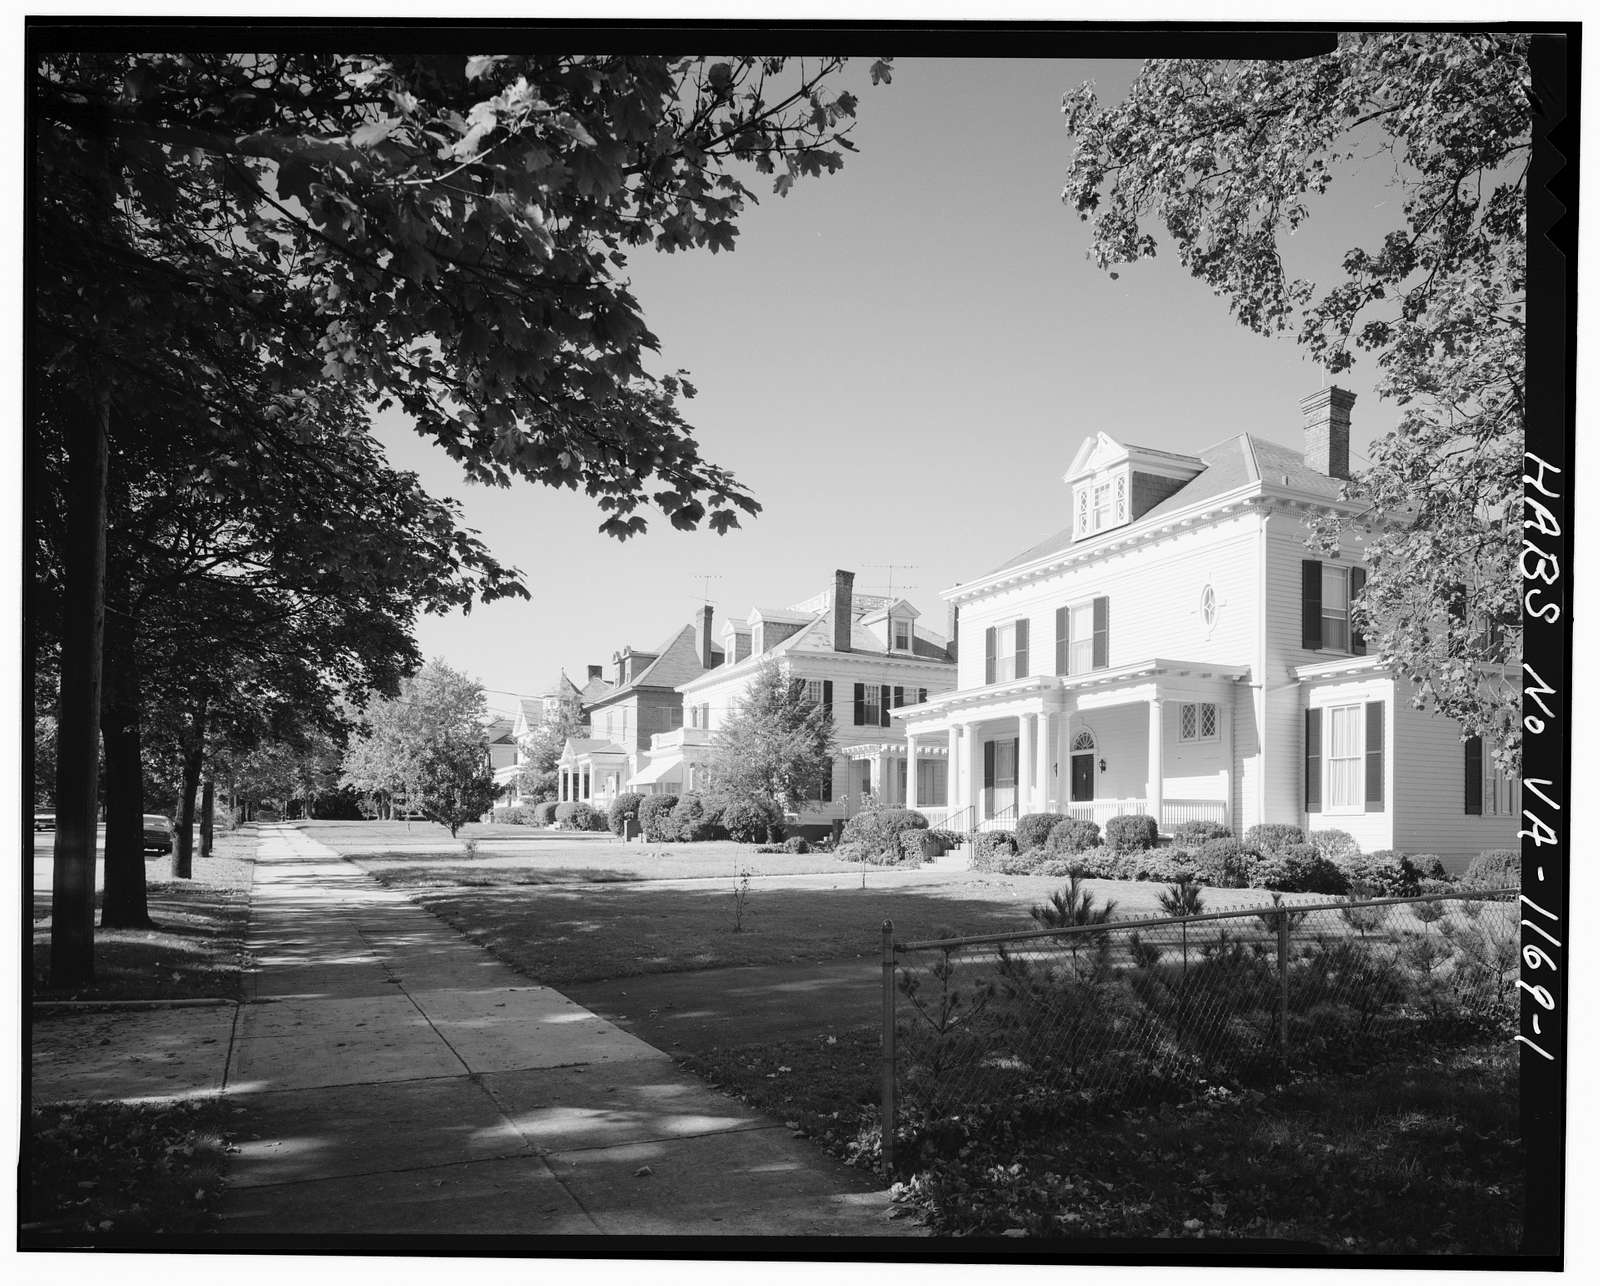 1500 Block Rivermont Avenue (Houses), Lynchburg, Lynchburg, VA